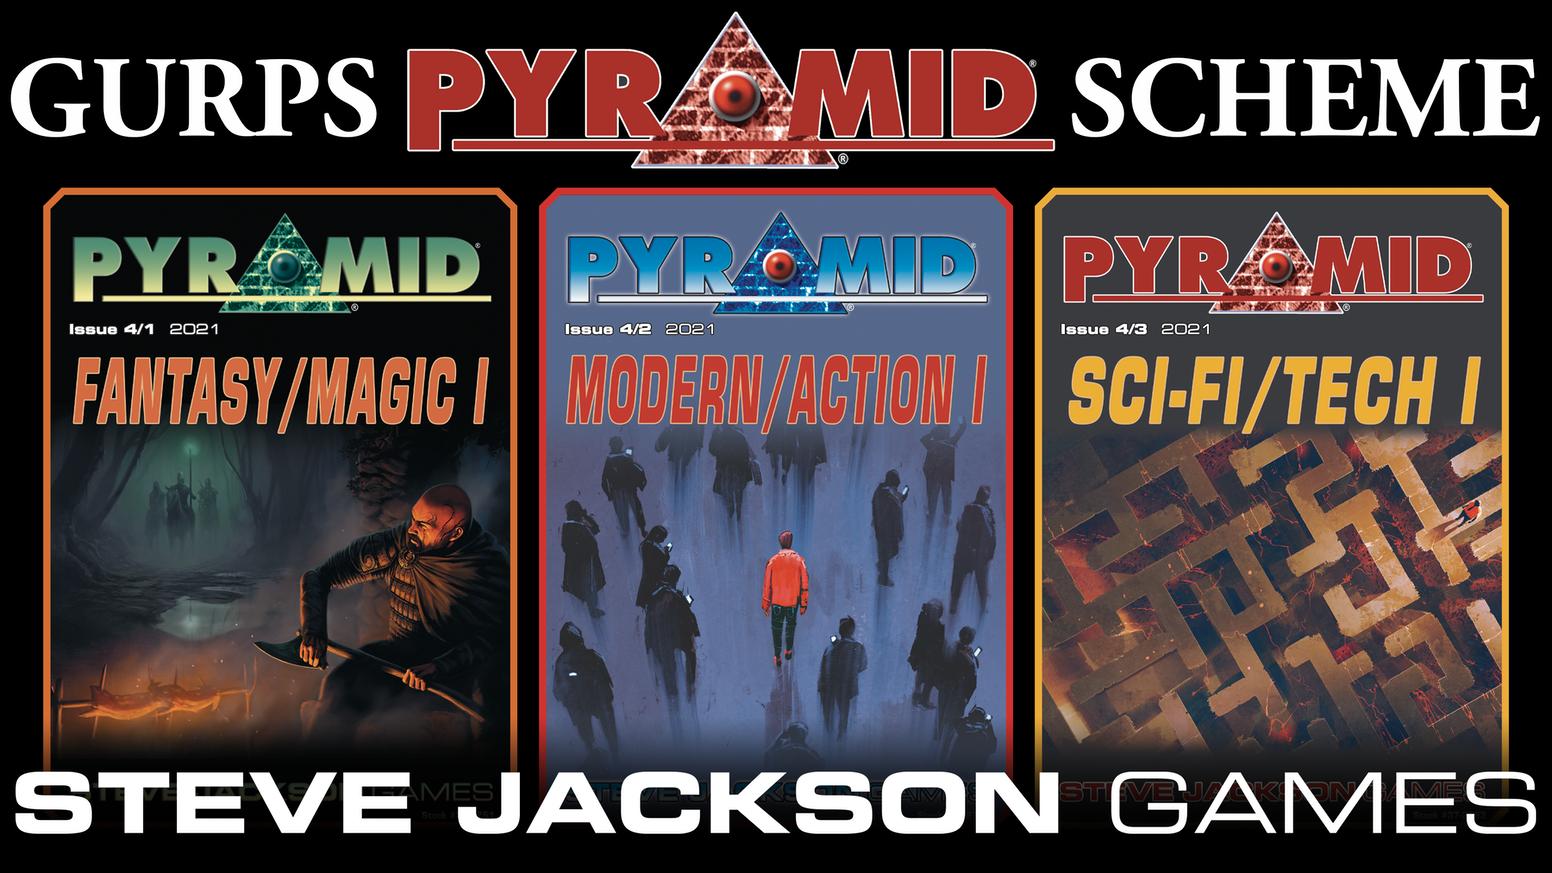 Steve Jackson Games  GURPS Pyramid Scheme